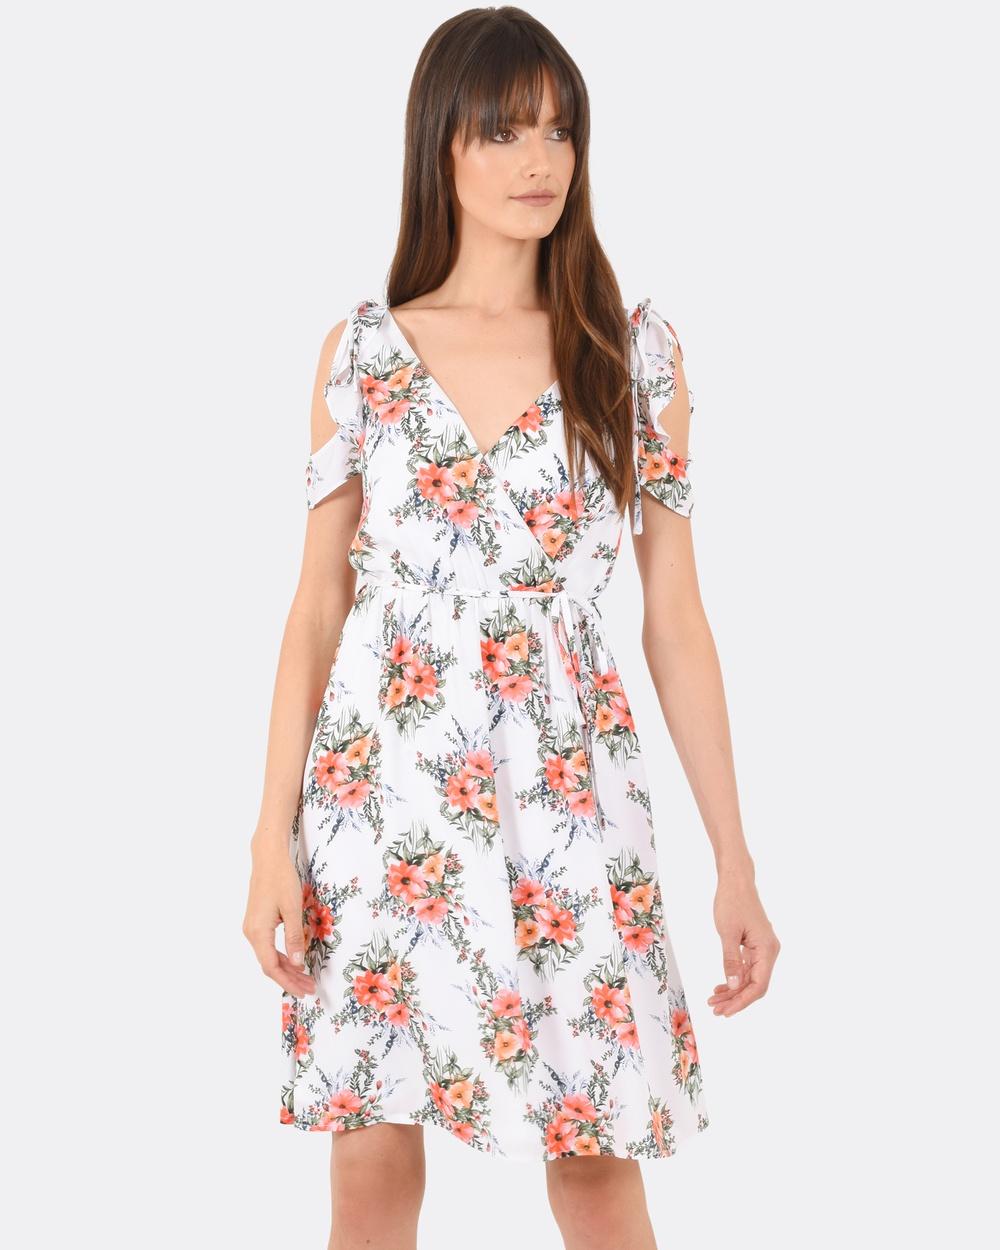 Forcast Milania Frill Wrap Dress Dresses Ivory Milania Frill Wrap Dress